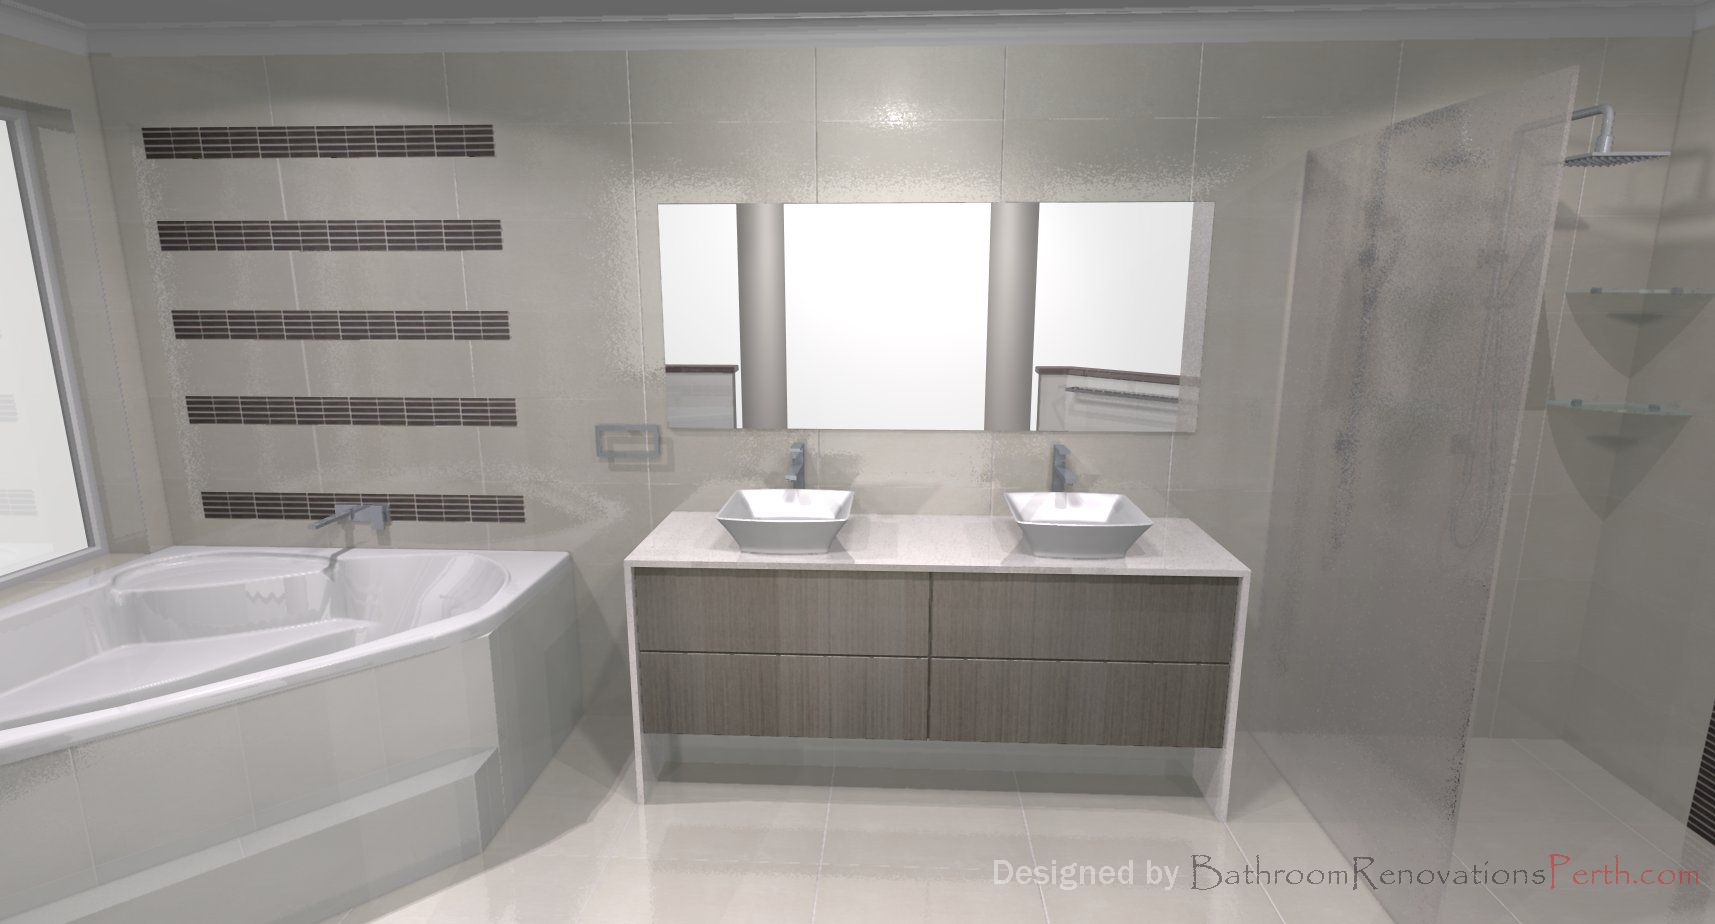 Bathroom designers perth - Bathroom Renovations Perth